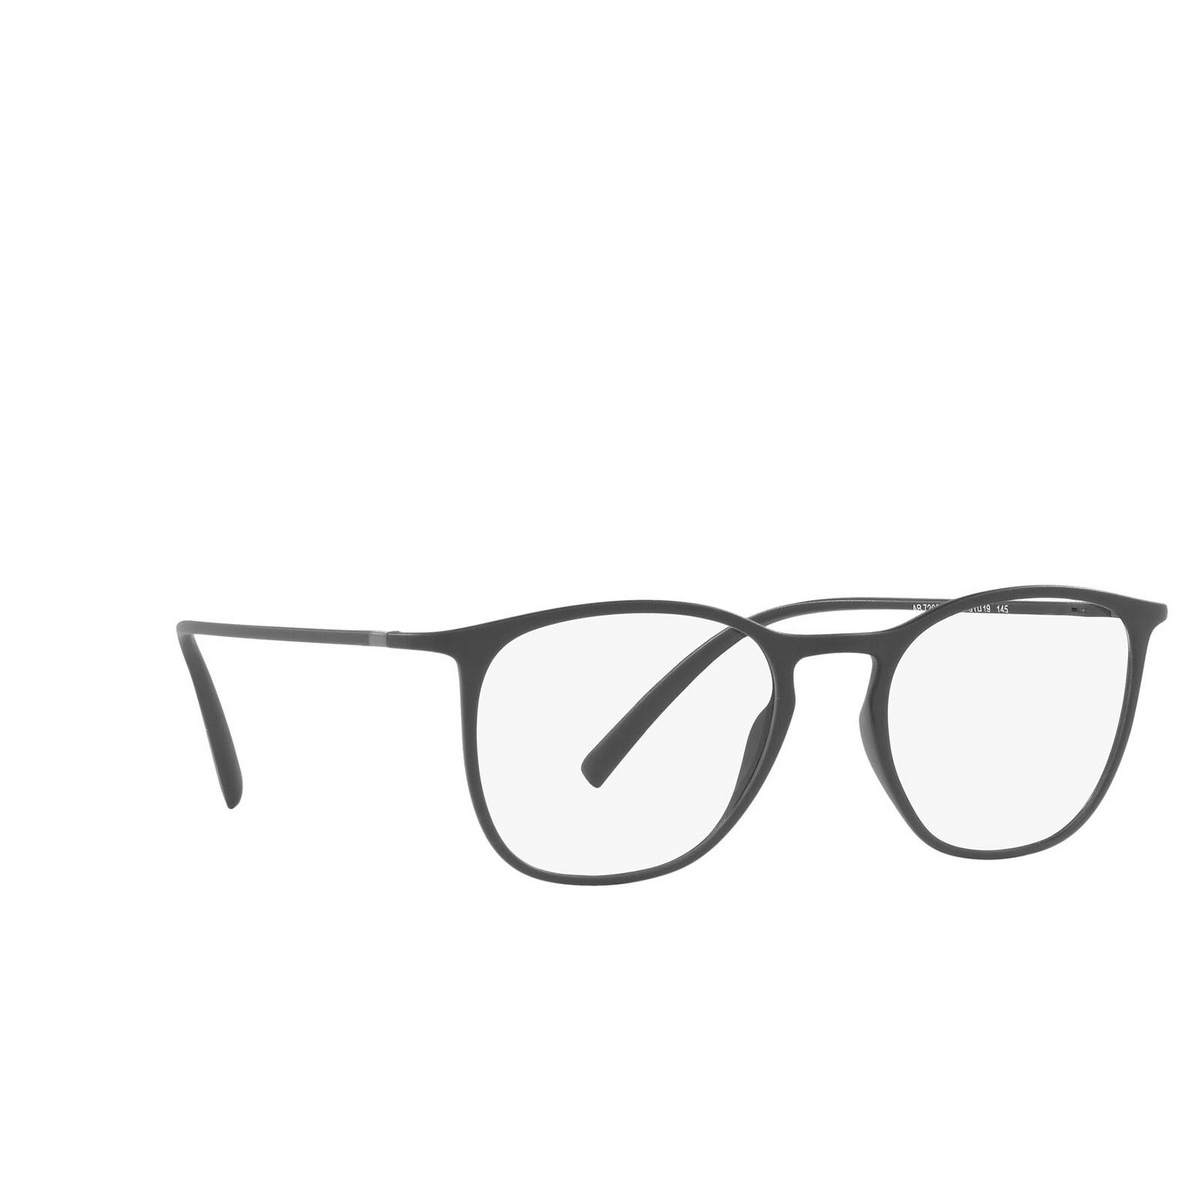 Giorgio Armani® Square Eyeglasses: AR7202 color Matte Grey 5060 - three-quarters view.